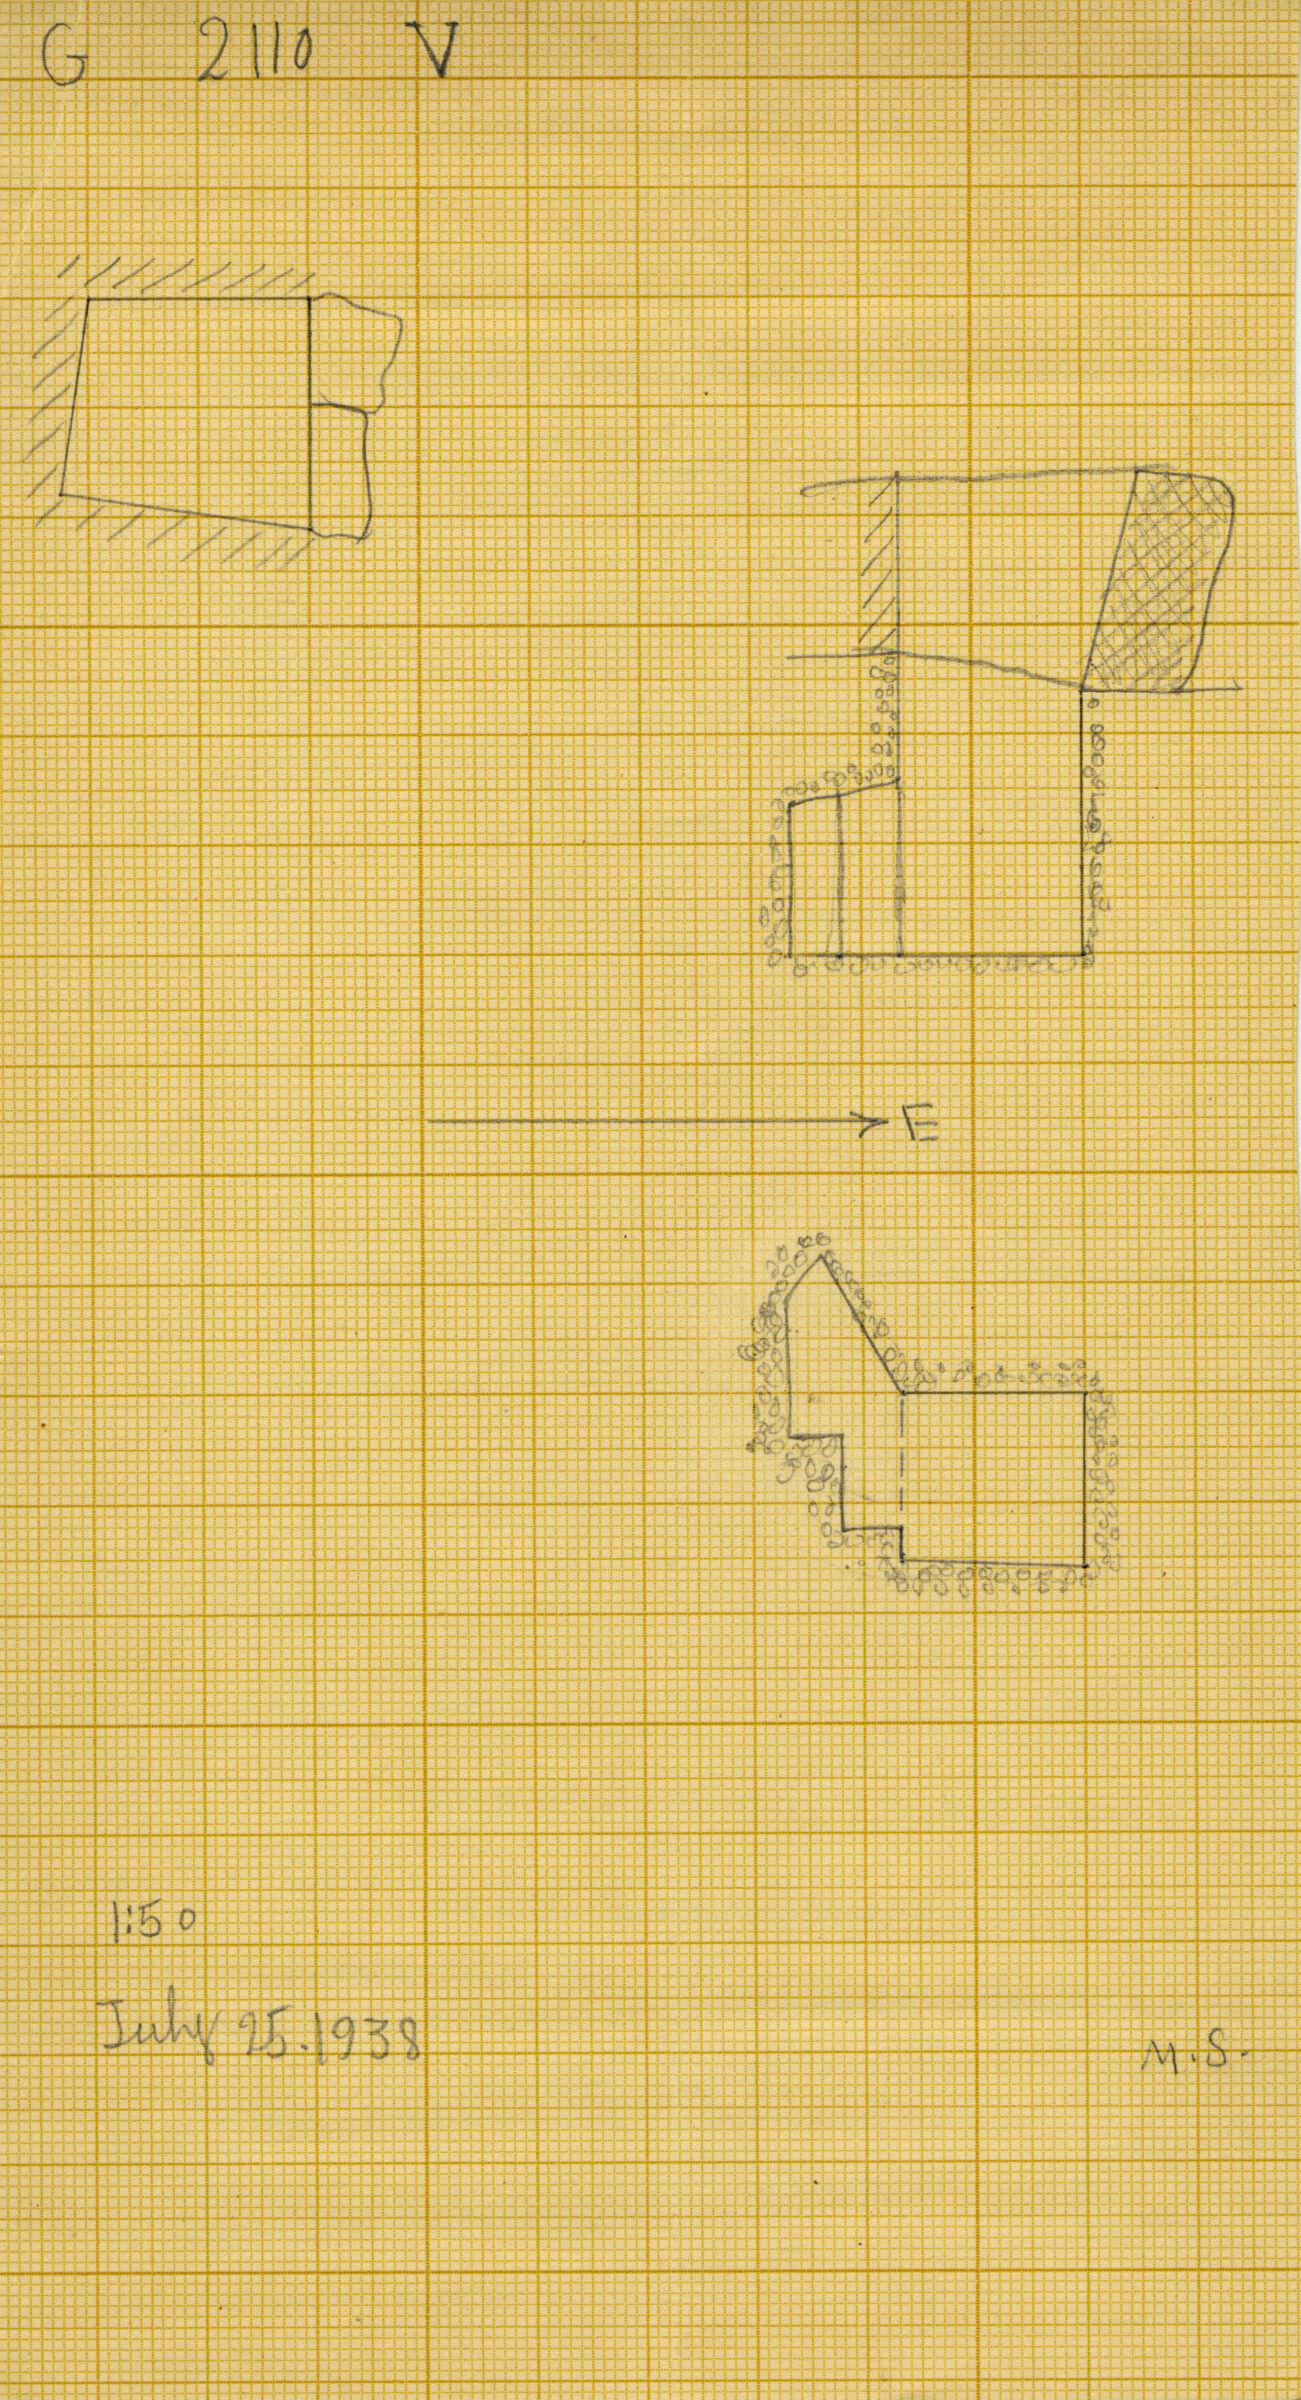 Maps and plans: G 2110, Shaft V